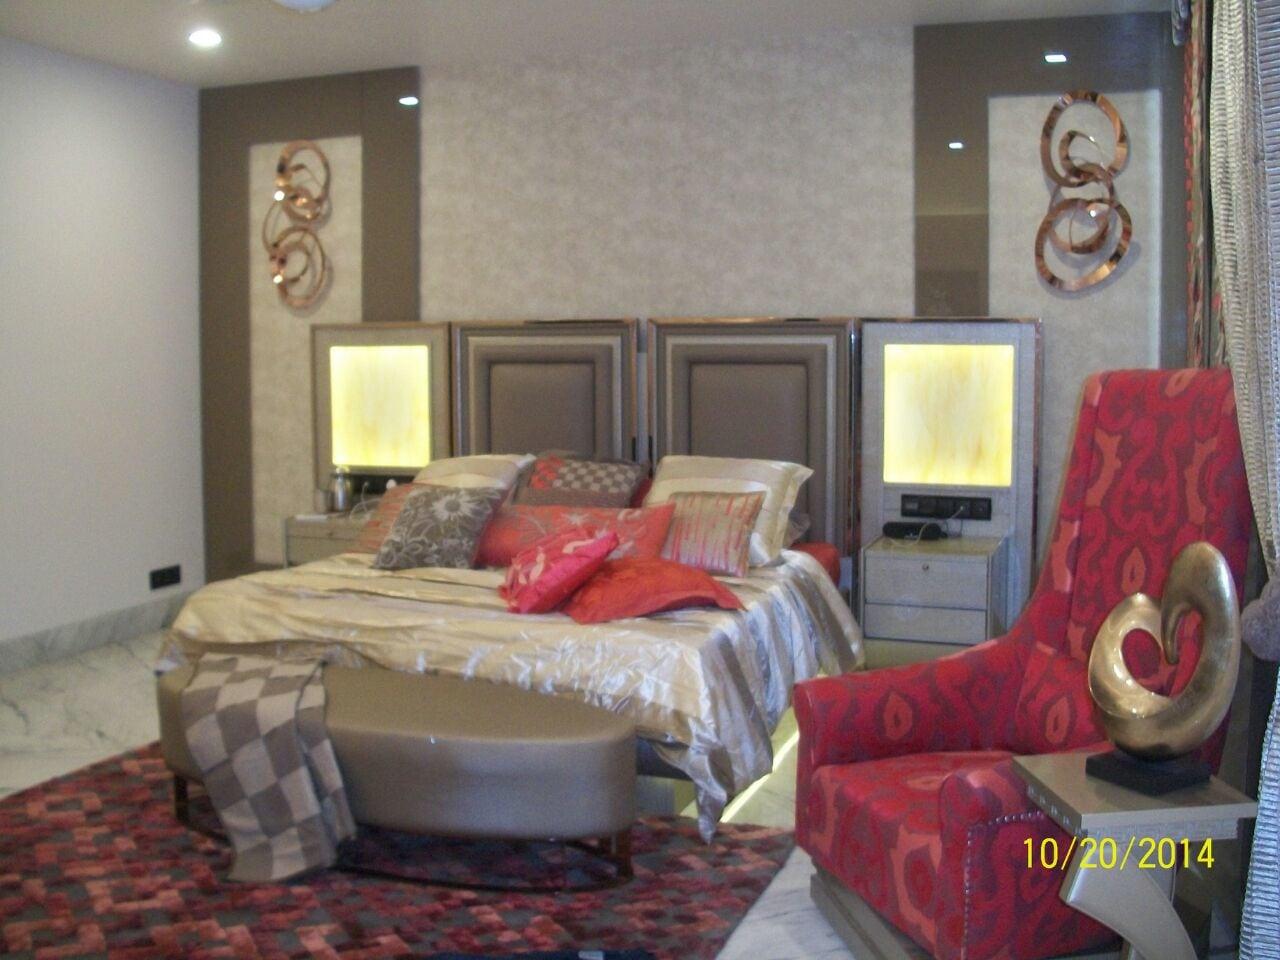 Marble Flooring In Bedroom by Khayati Bedroom Modern   Interior Design Photos & Ideas